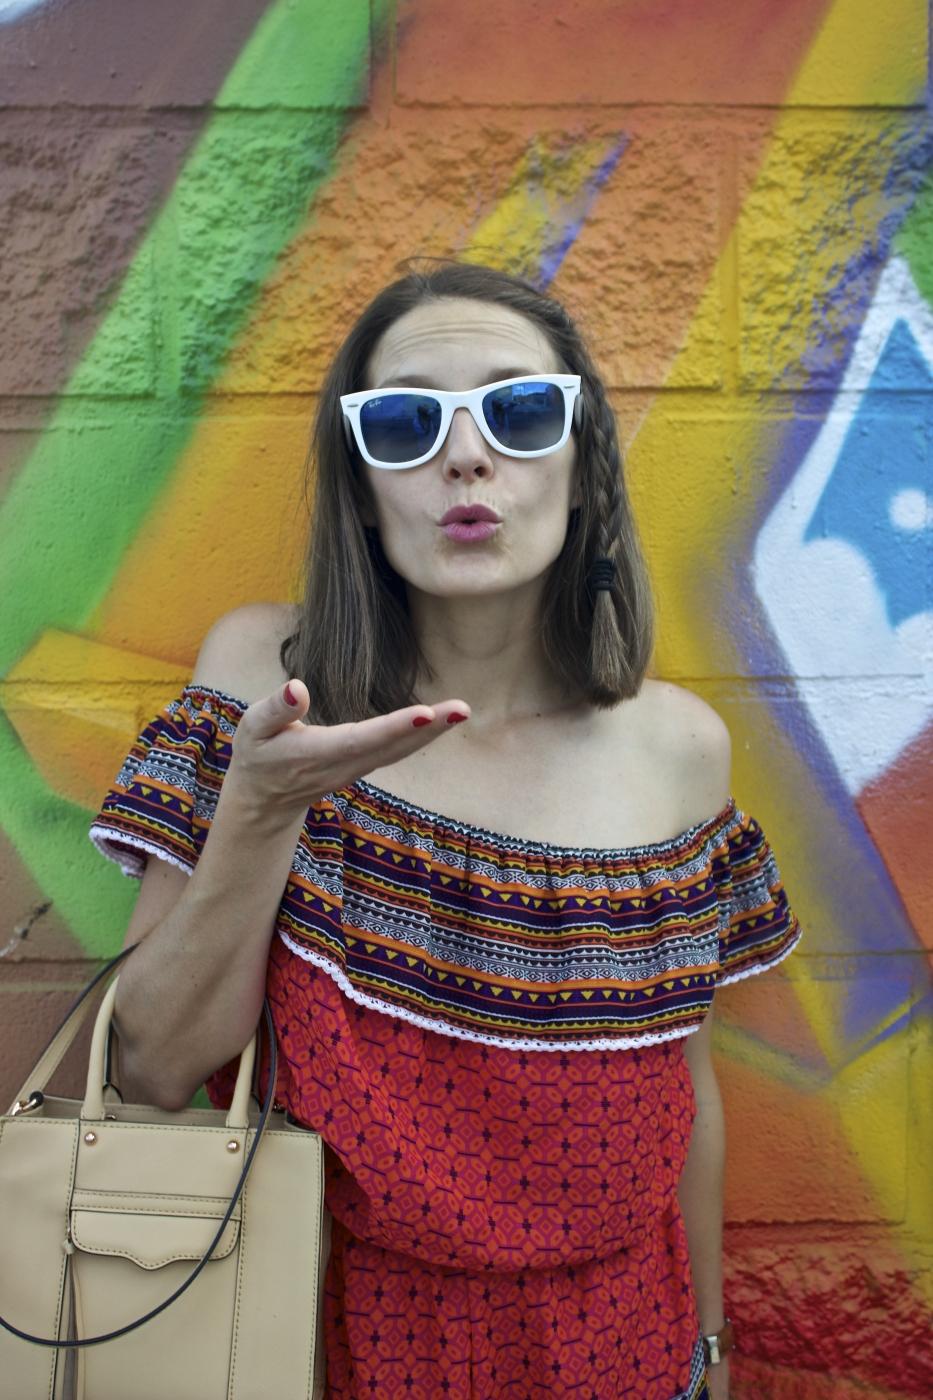 lara-vazquez-mad-lula-style-blog-fashion-moda-glamour-vogue-kiss-me